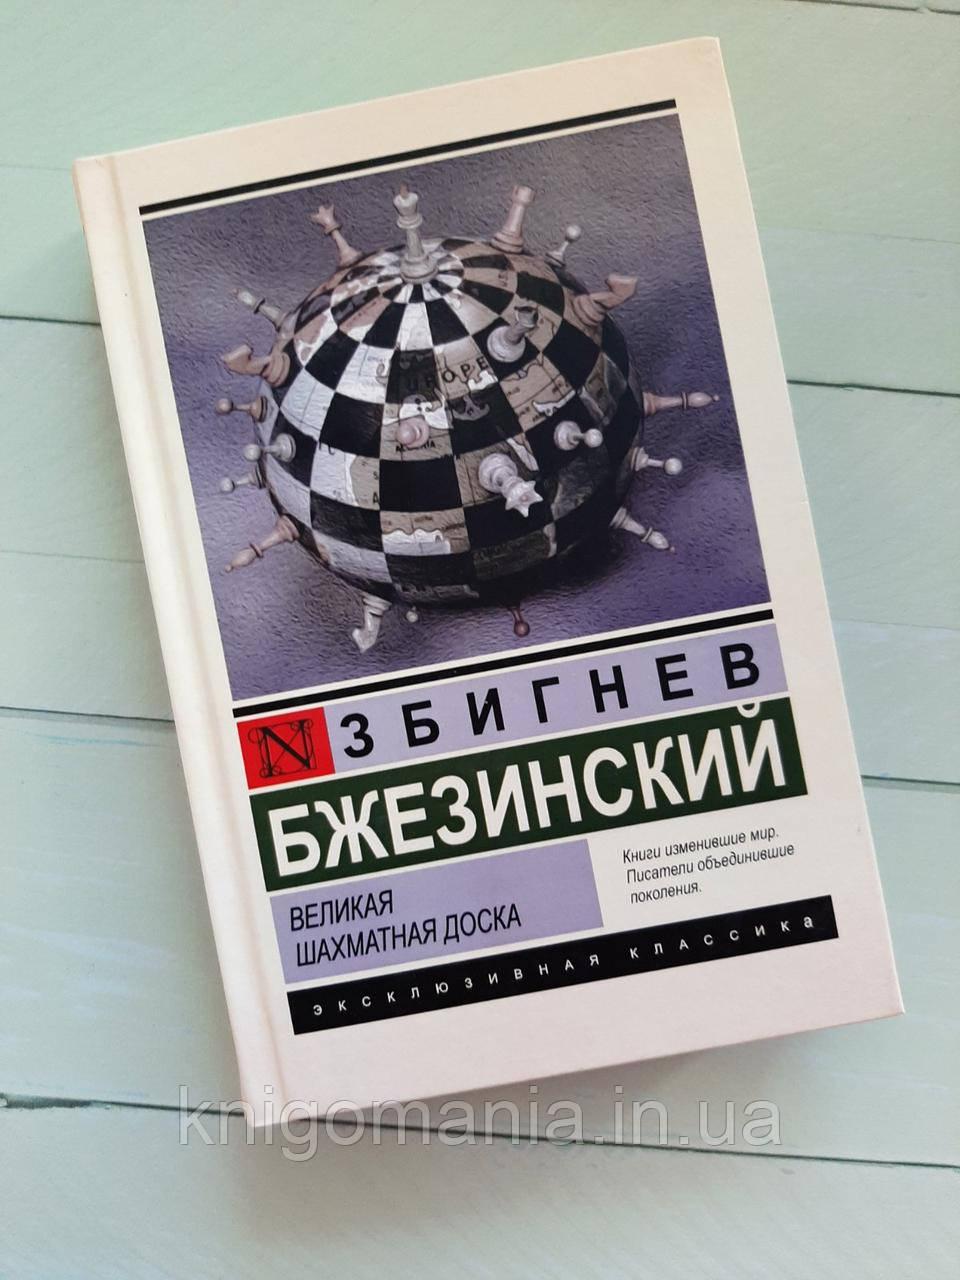 Великая шахматная доска. Збигнев Бжезинский.